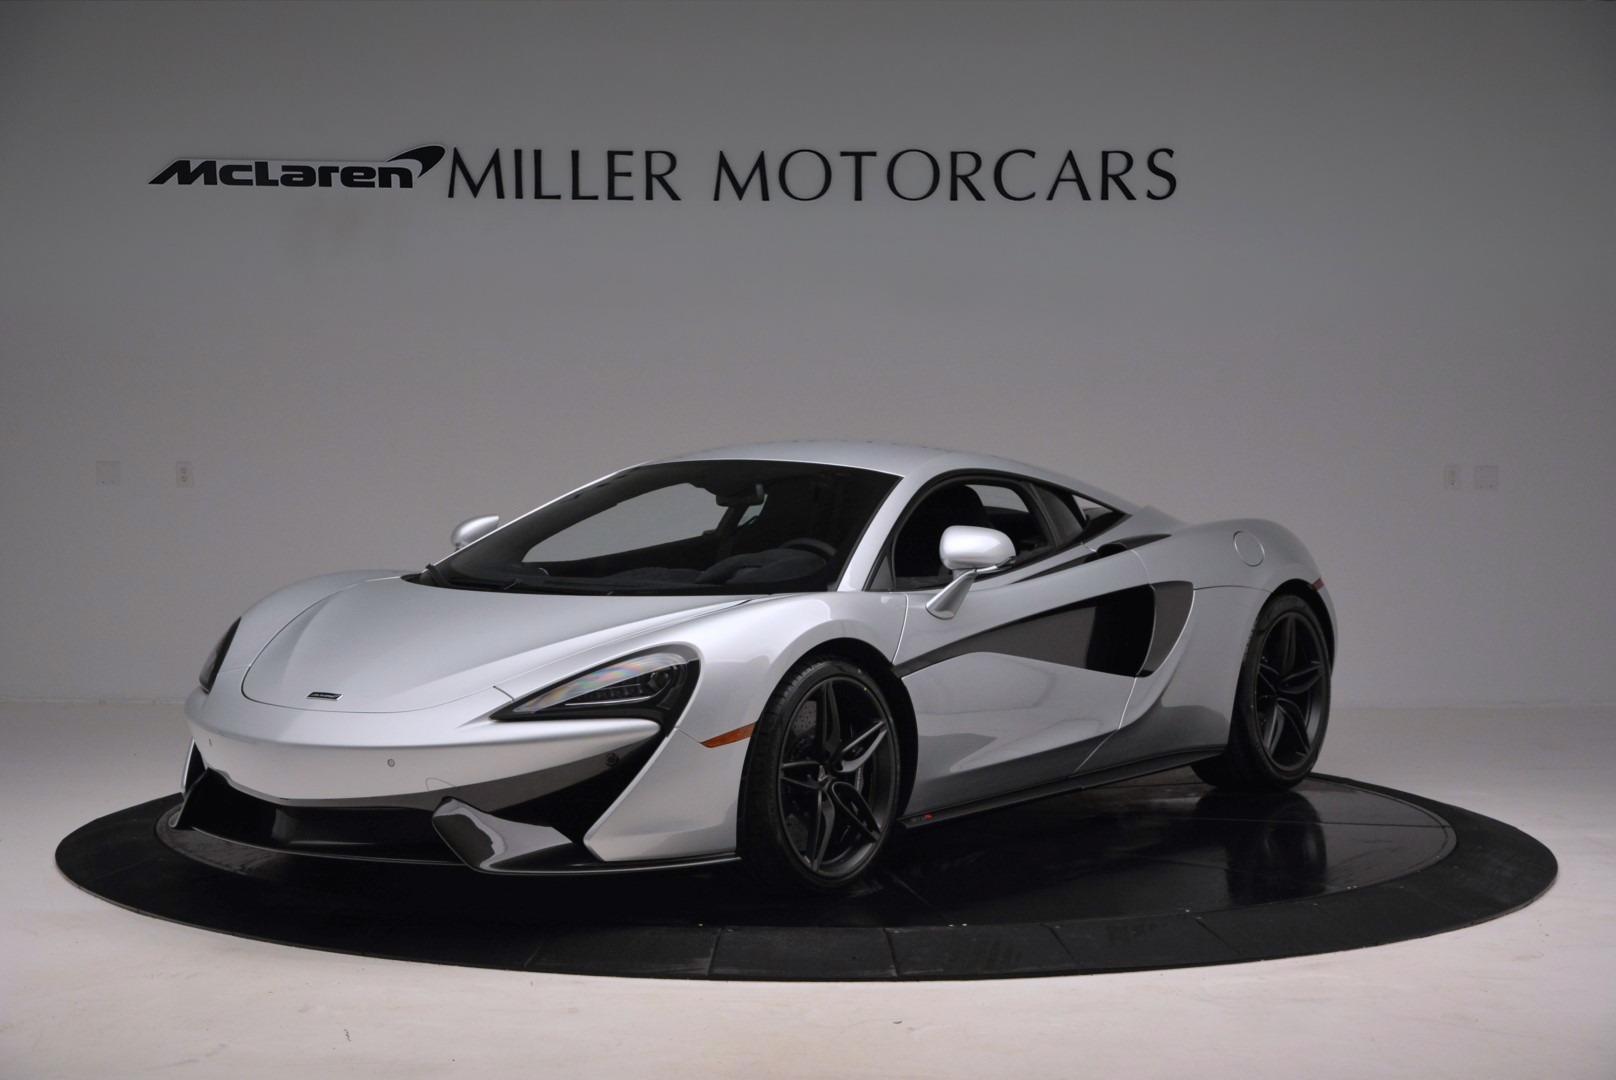 Used 2017 McLaren 570S Coupe for sale $149,900 at Maserati of Westport in Westport CT 06880 1